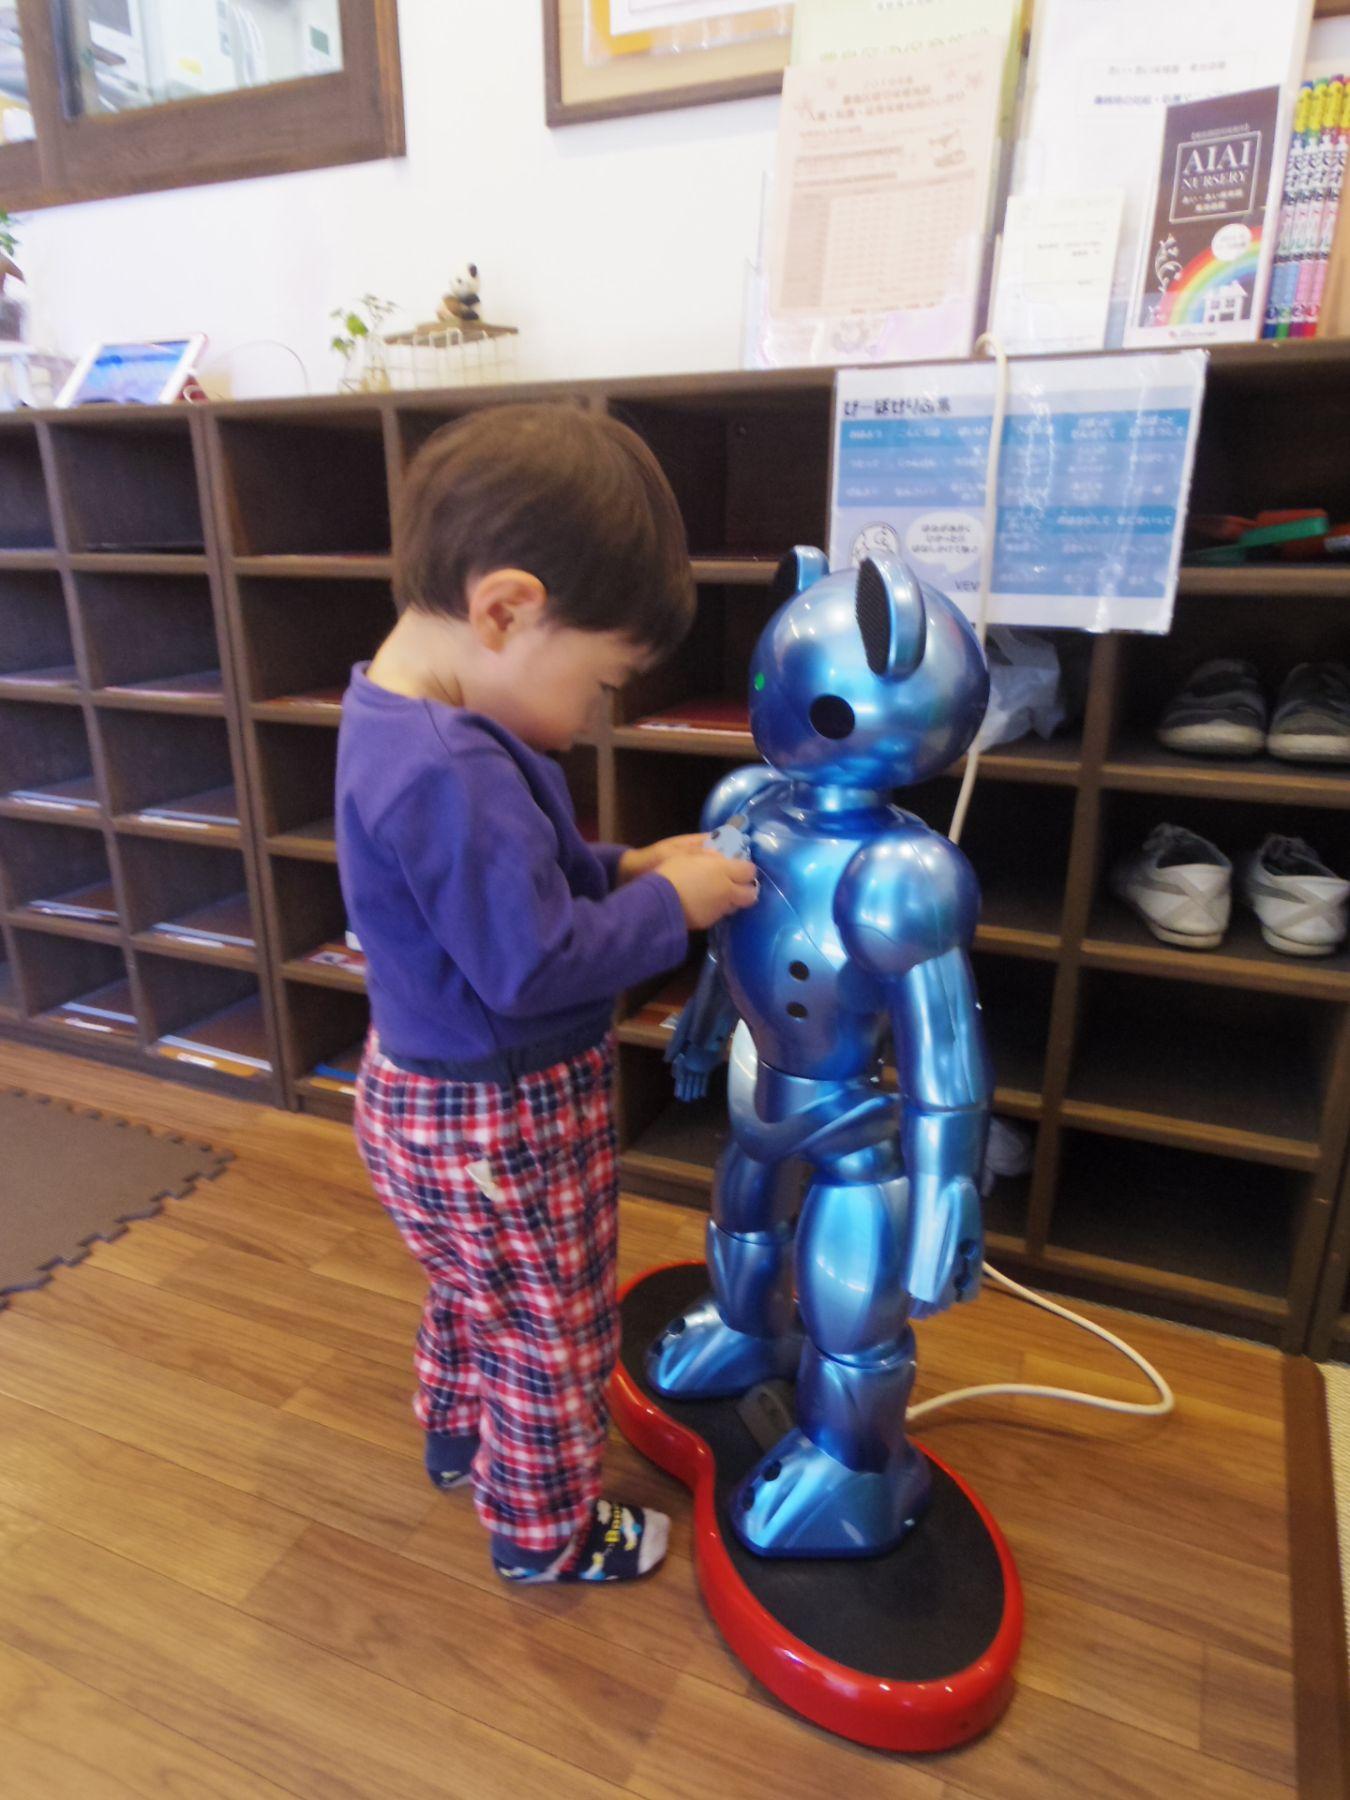 Japan Nursery School AI Robots 002